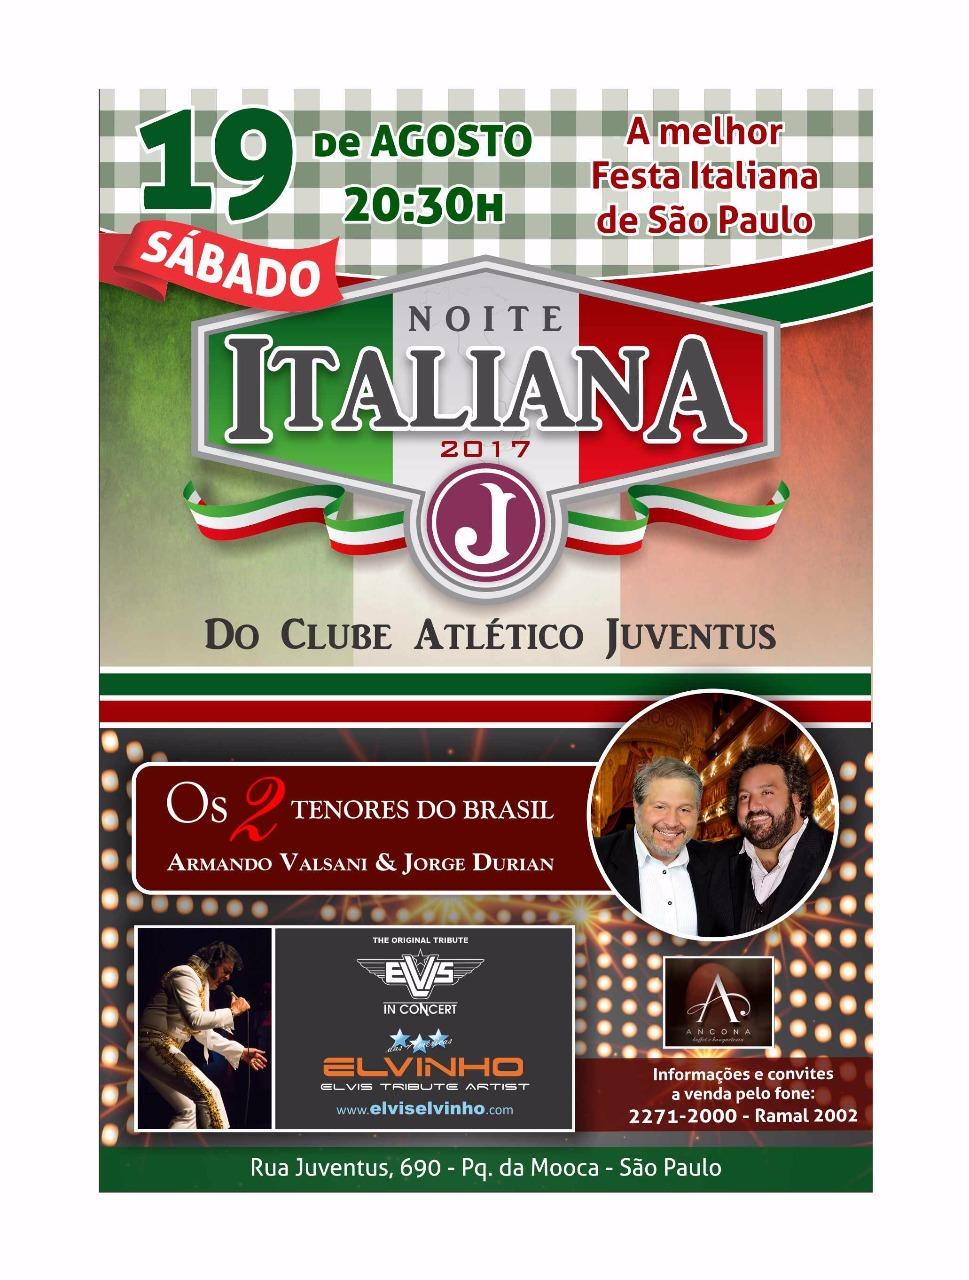 noite italiana 2017